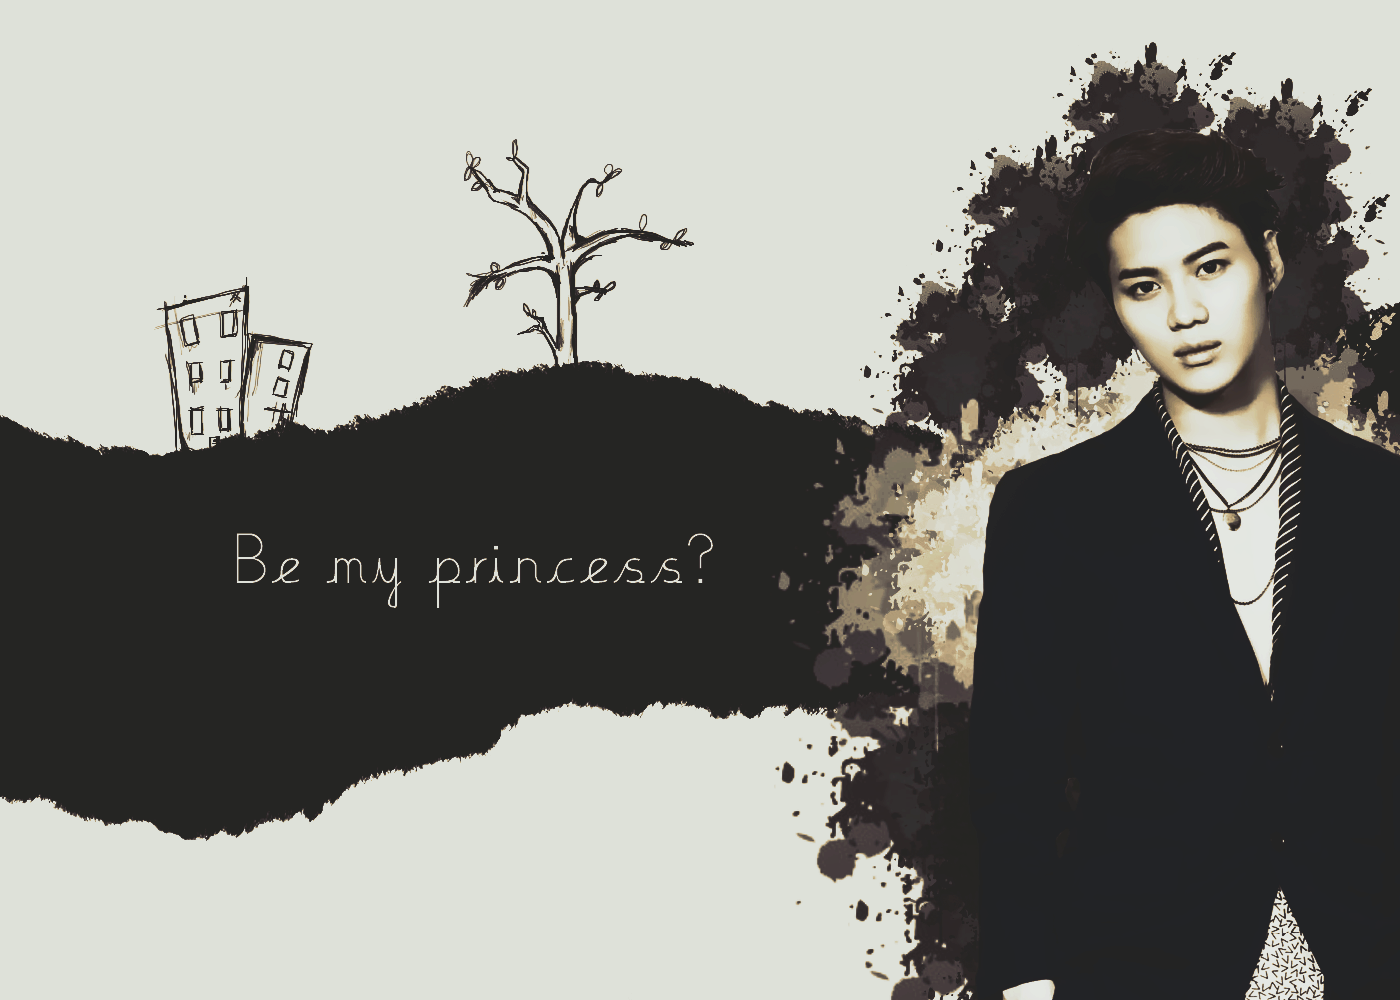 http://fc04.deviantart.net/fs70/f/2013/306/9/7/be_my_princess__by_shensheu-d6stc2h.png